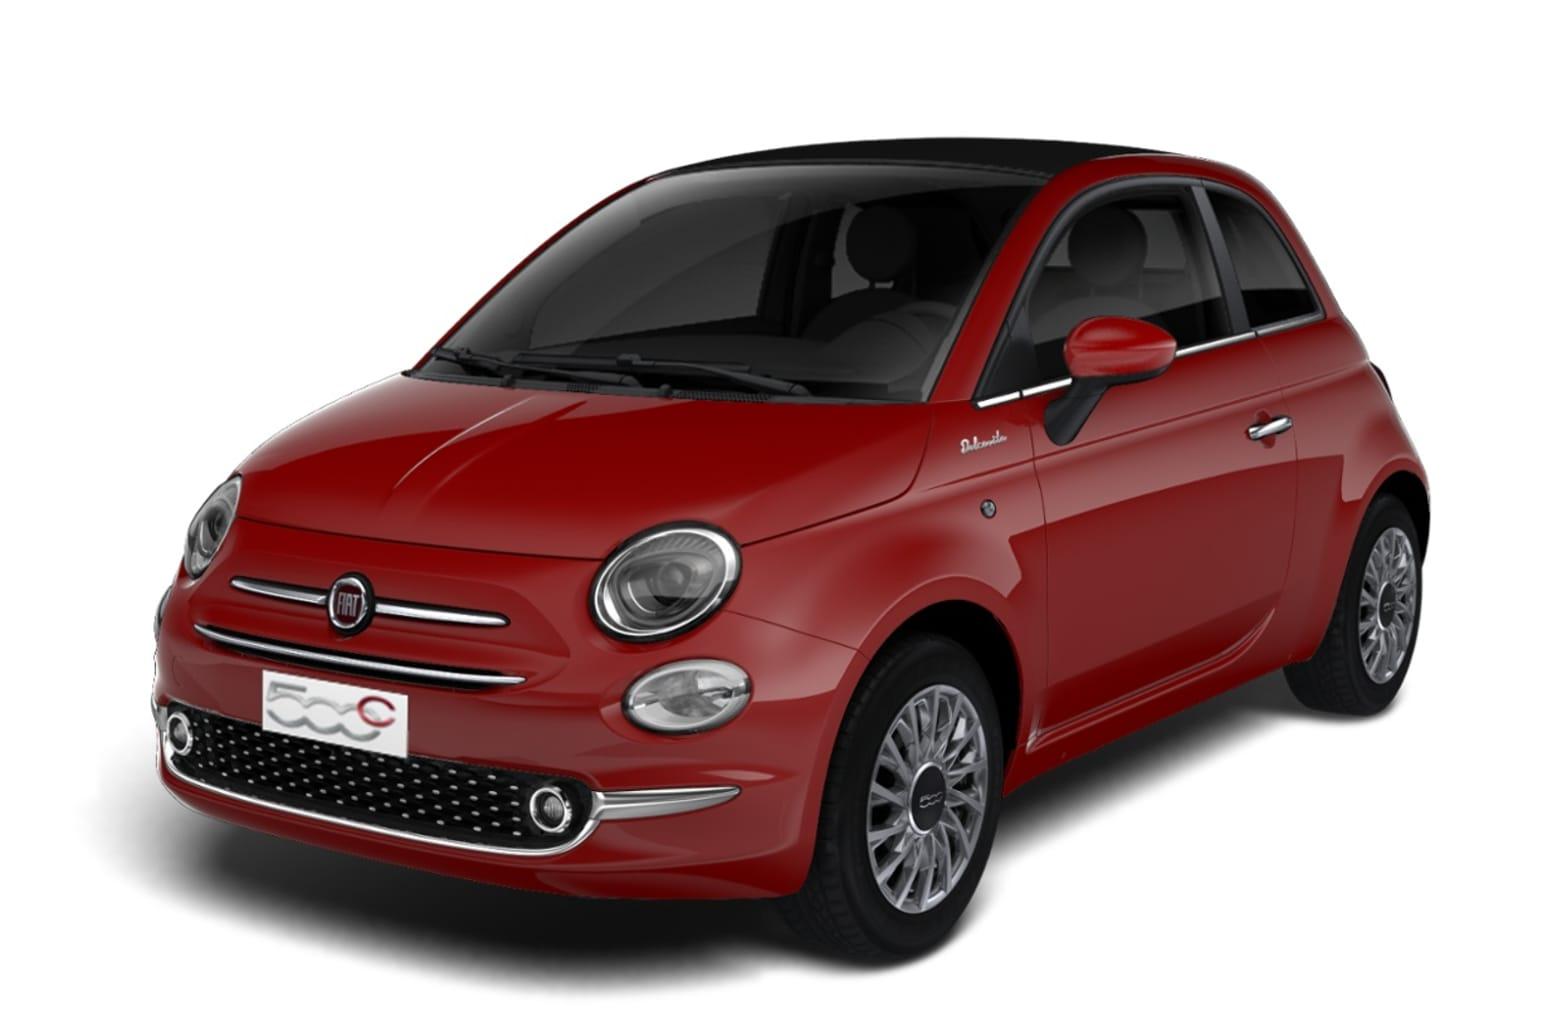 Fiat 500c 1.0 Hybrid DOLCEVITA [Part Leather]